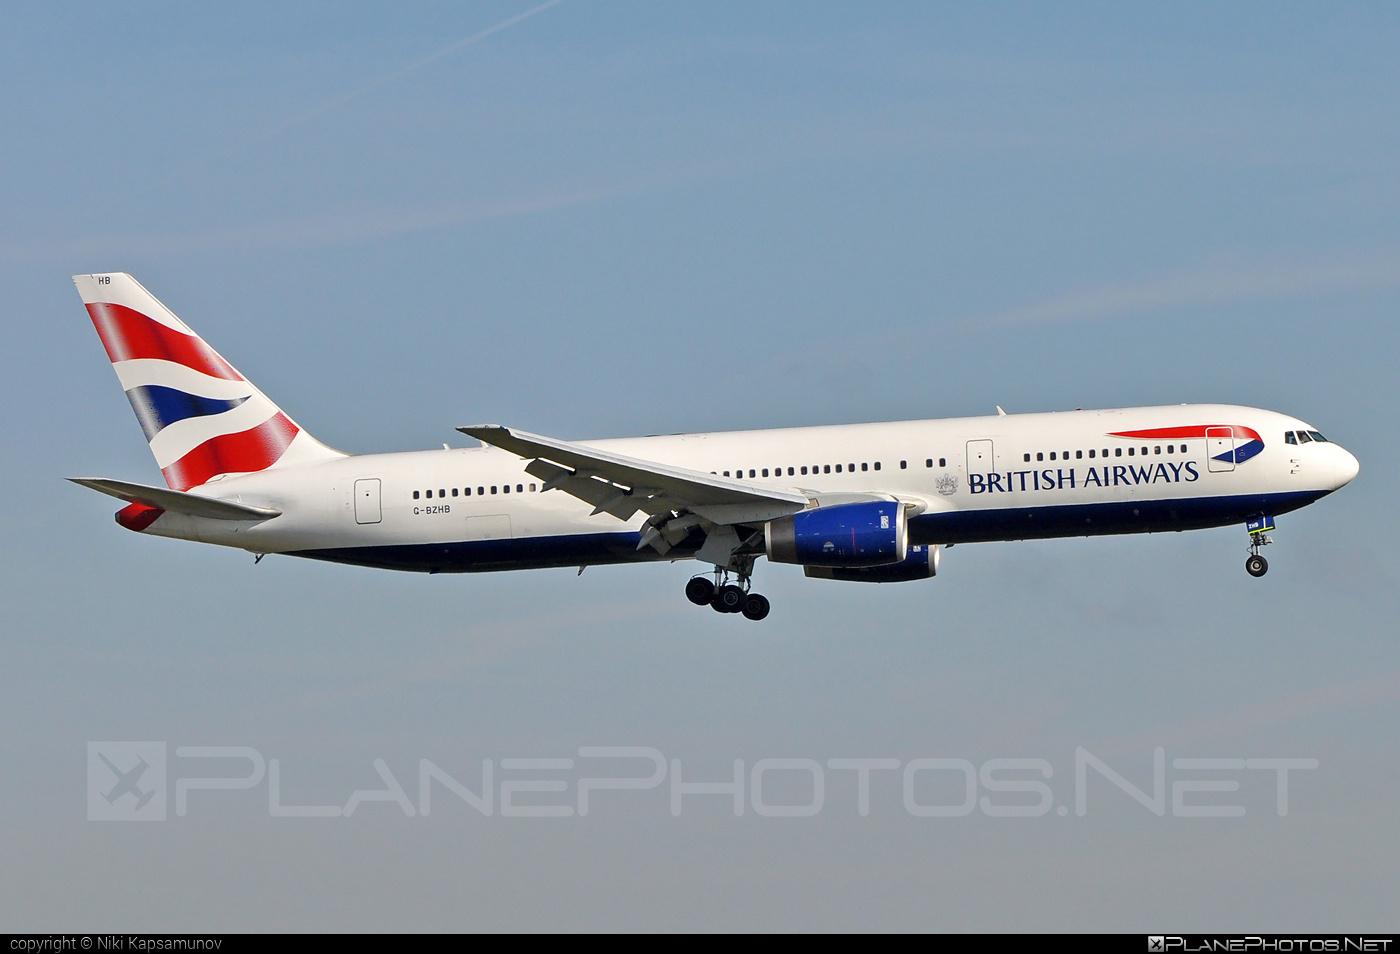 Boeing 767-300ER - G-BZHB operated by British Airways #b767 #b767er #boeing #boeing767 #britishairways